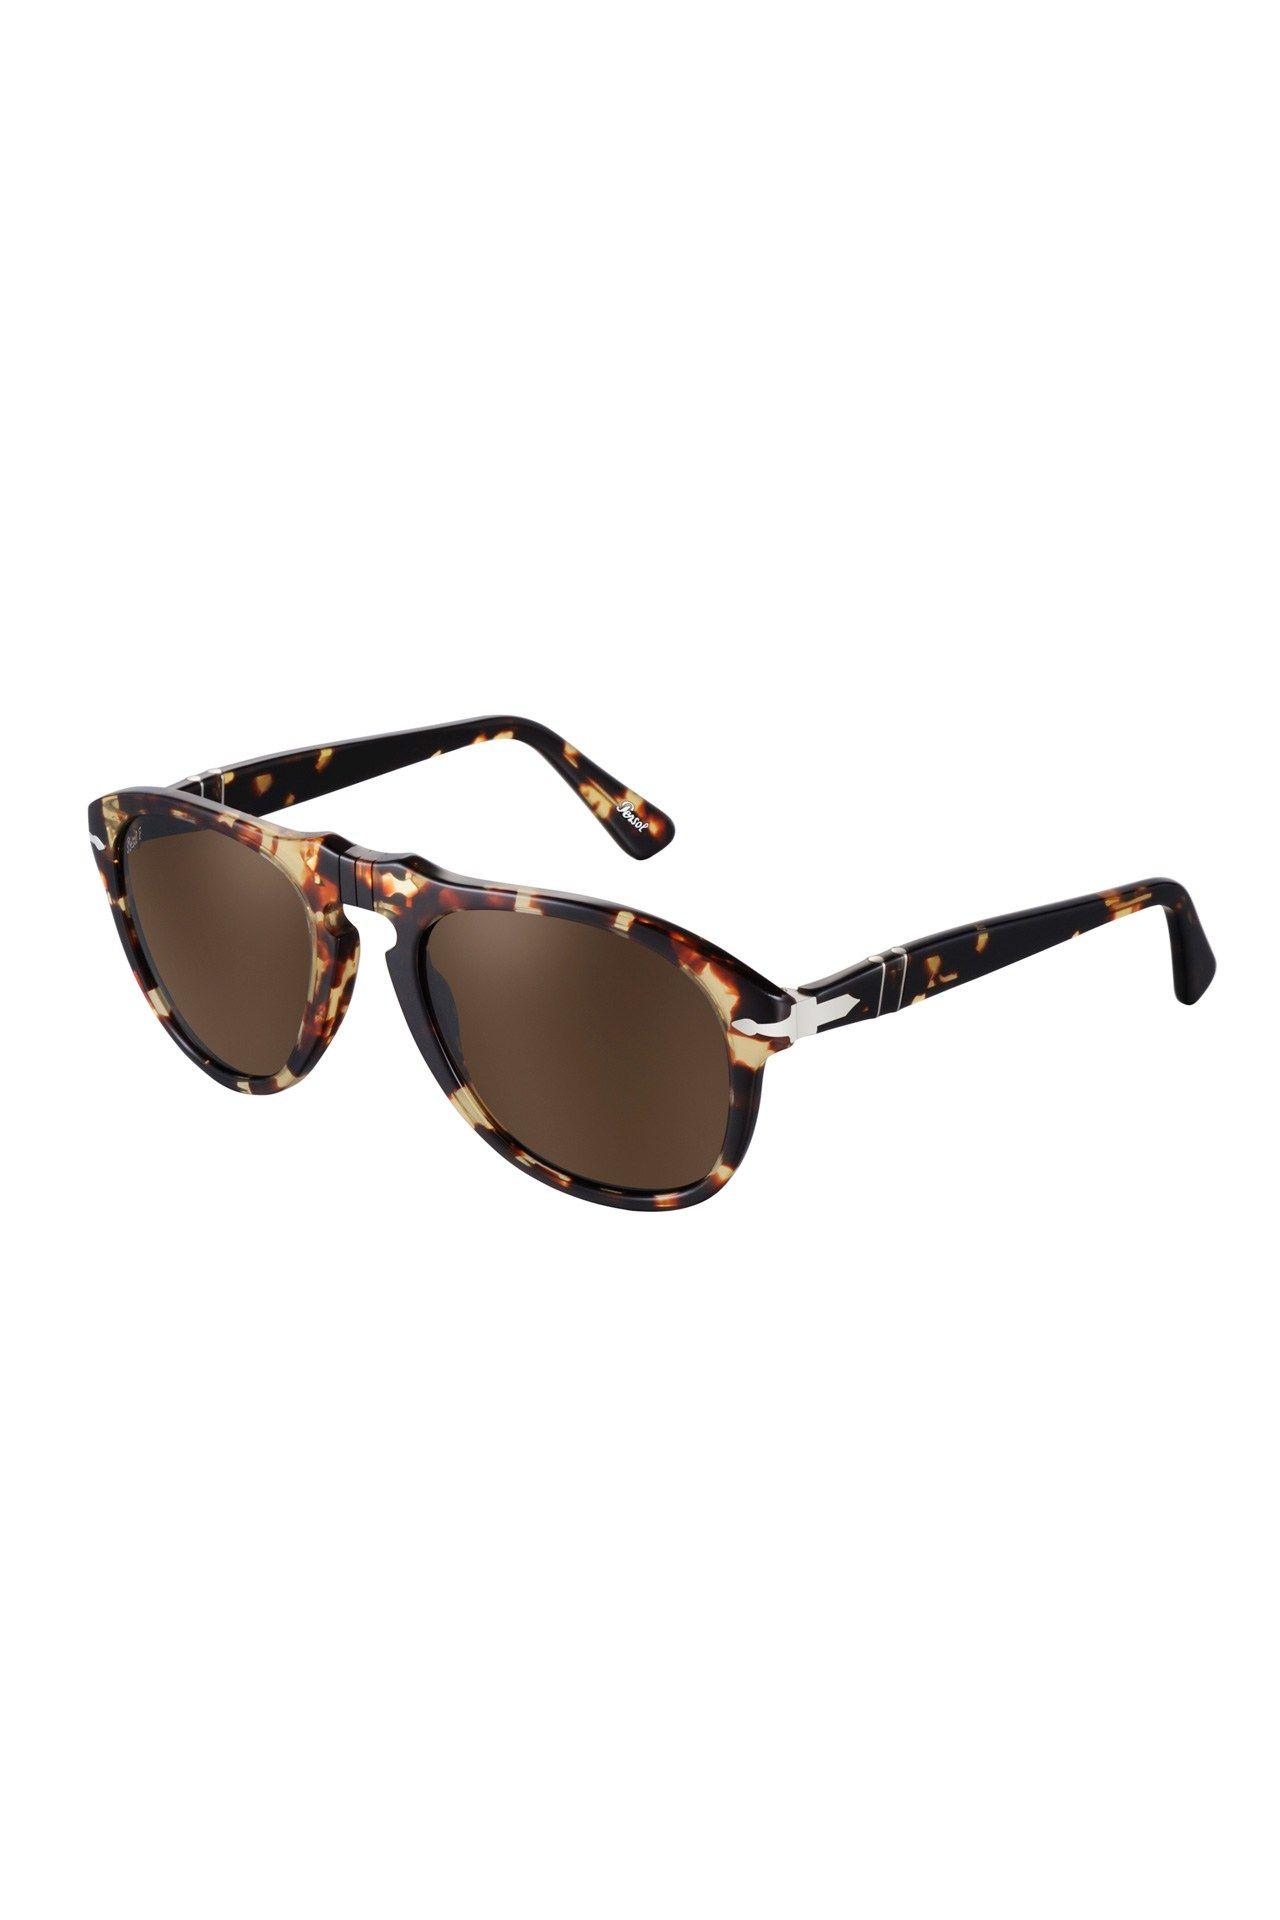 100 Best Sunglasses